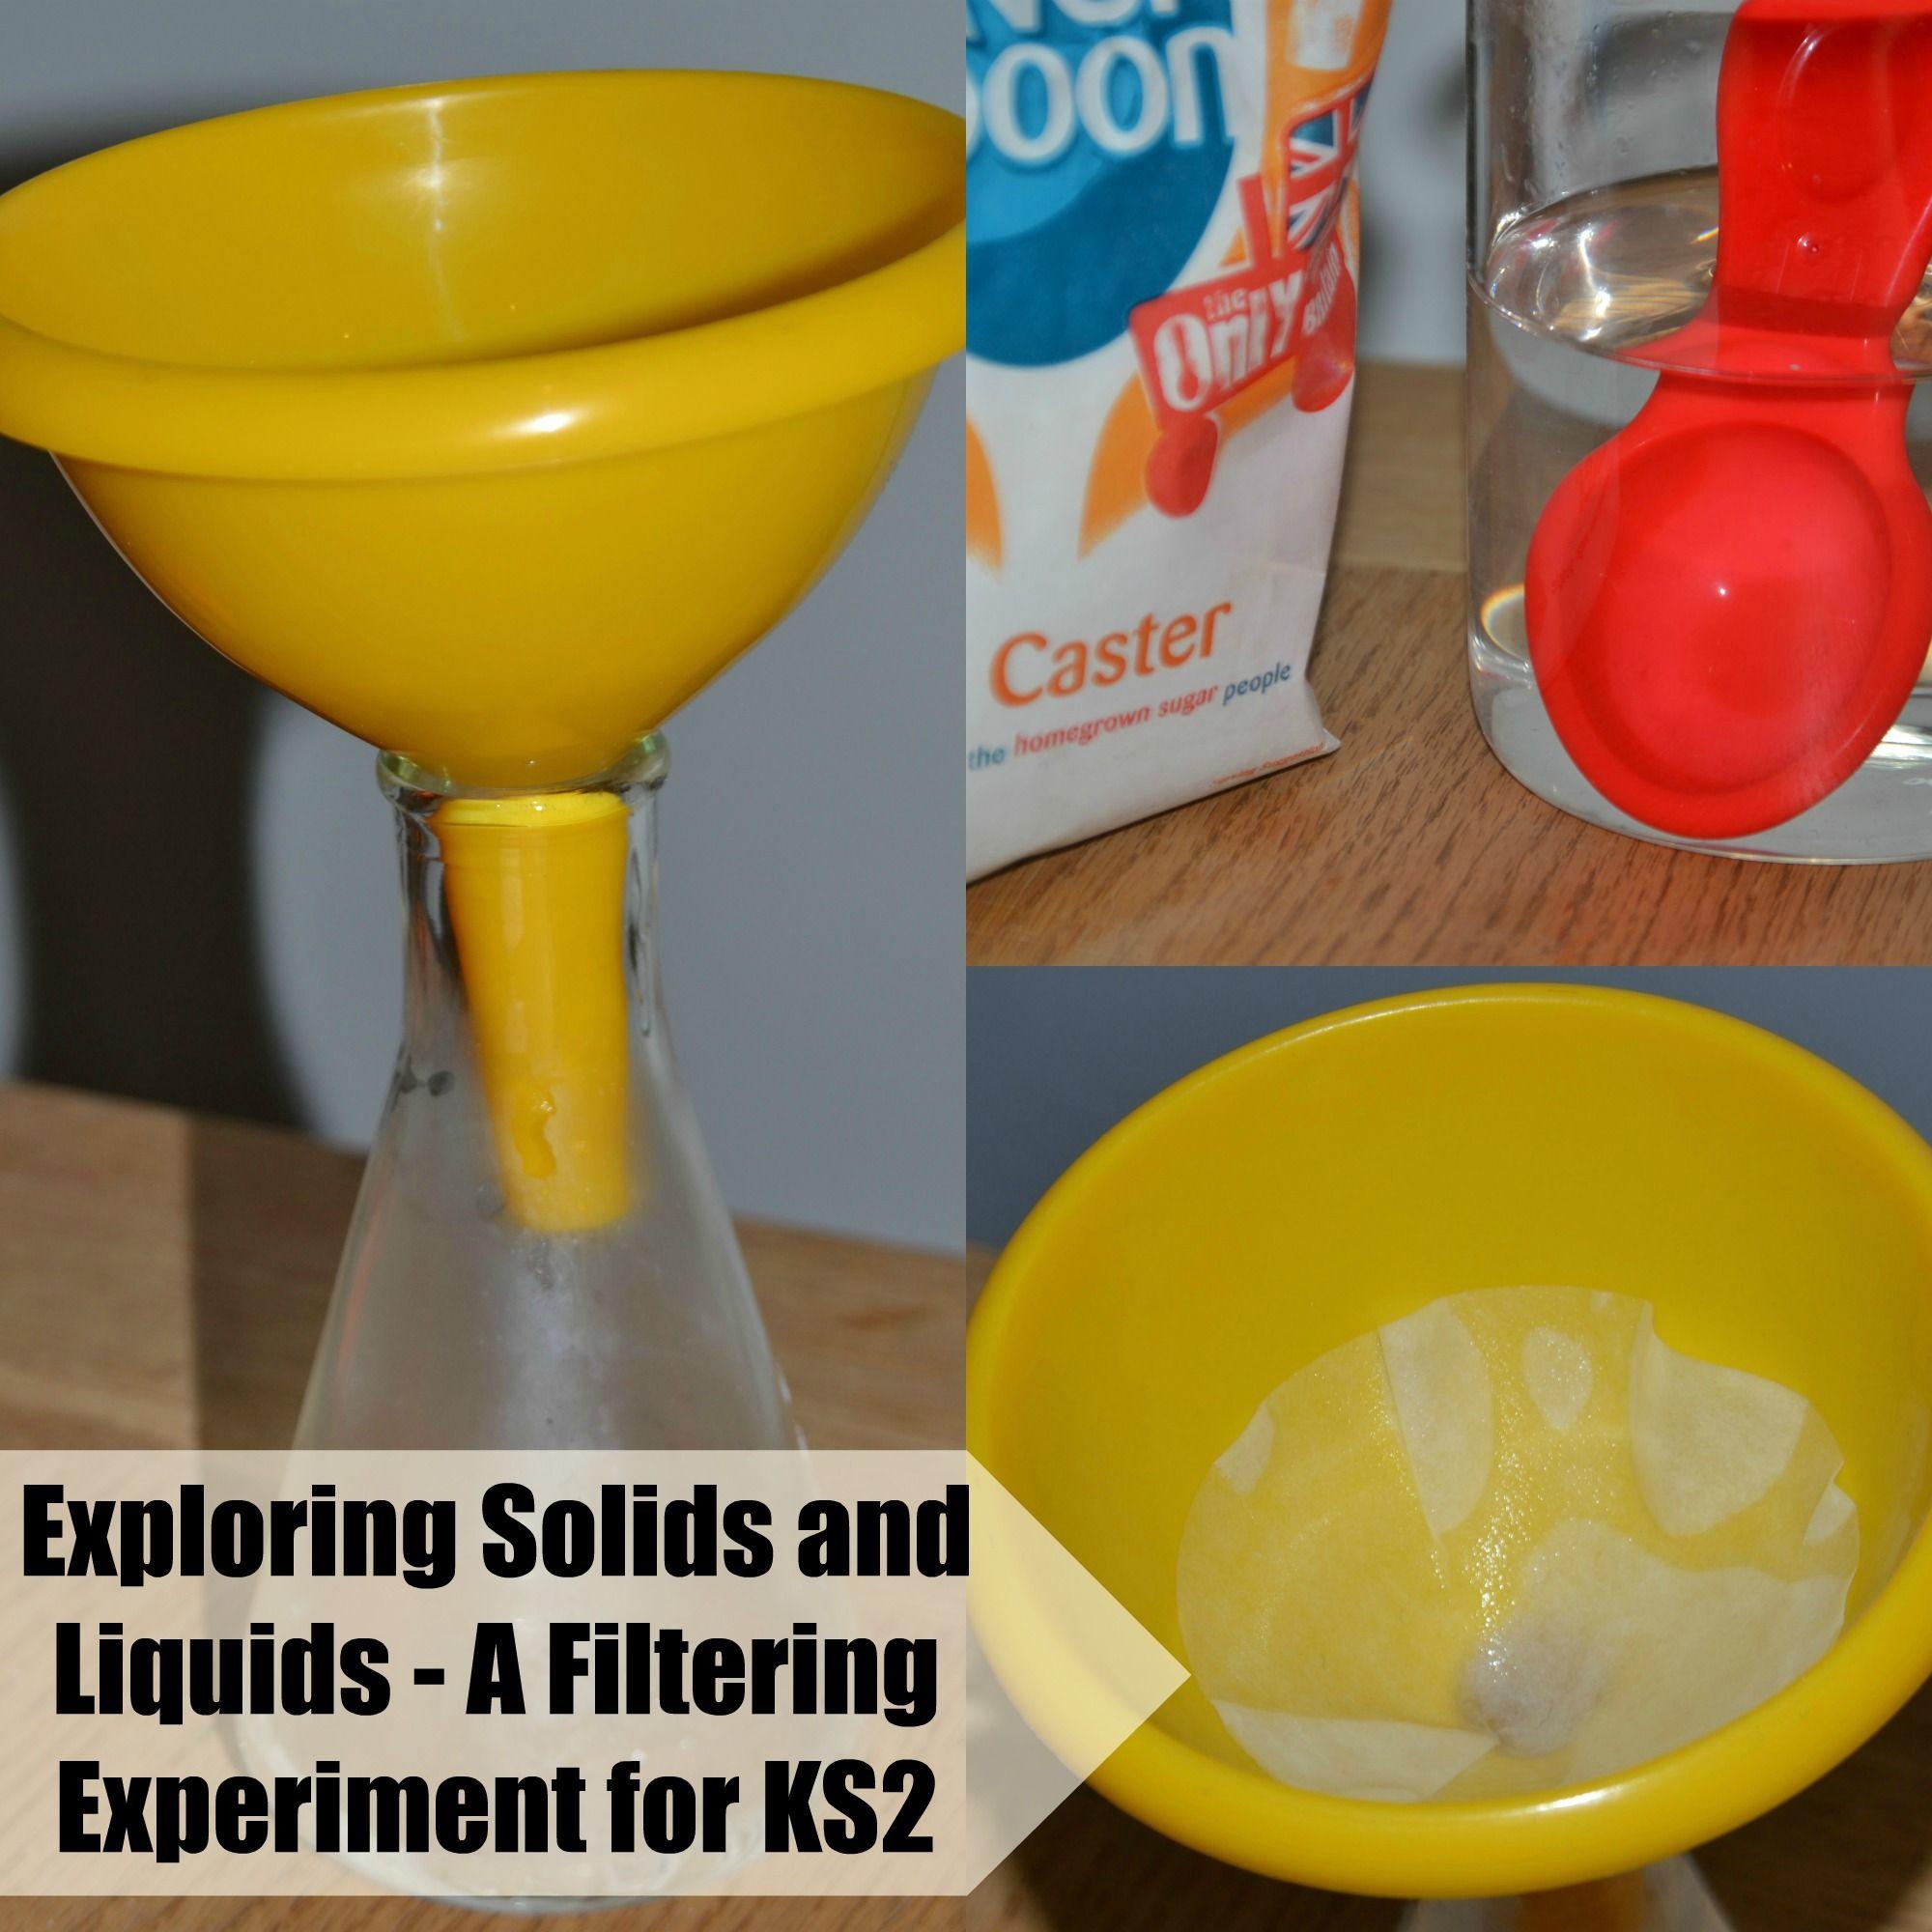 Filtering Experiment Ks2